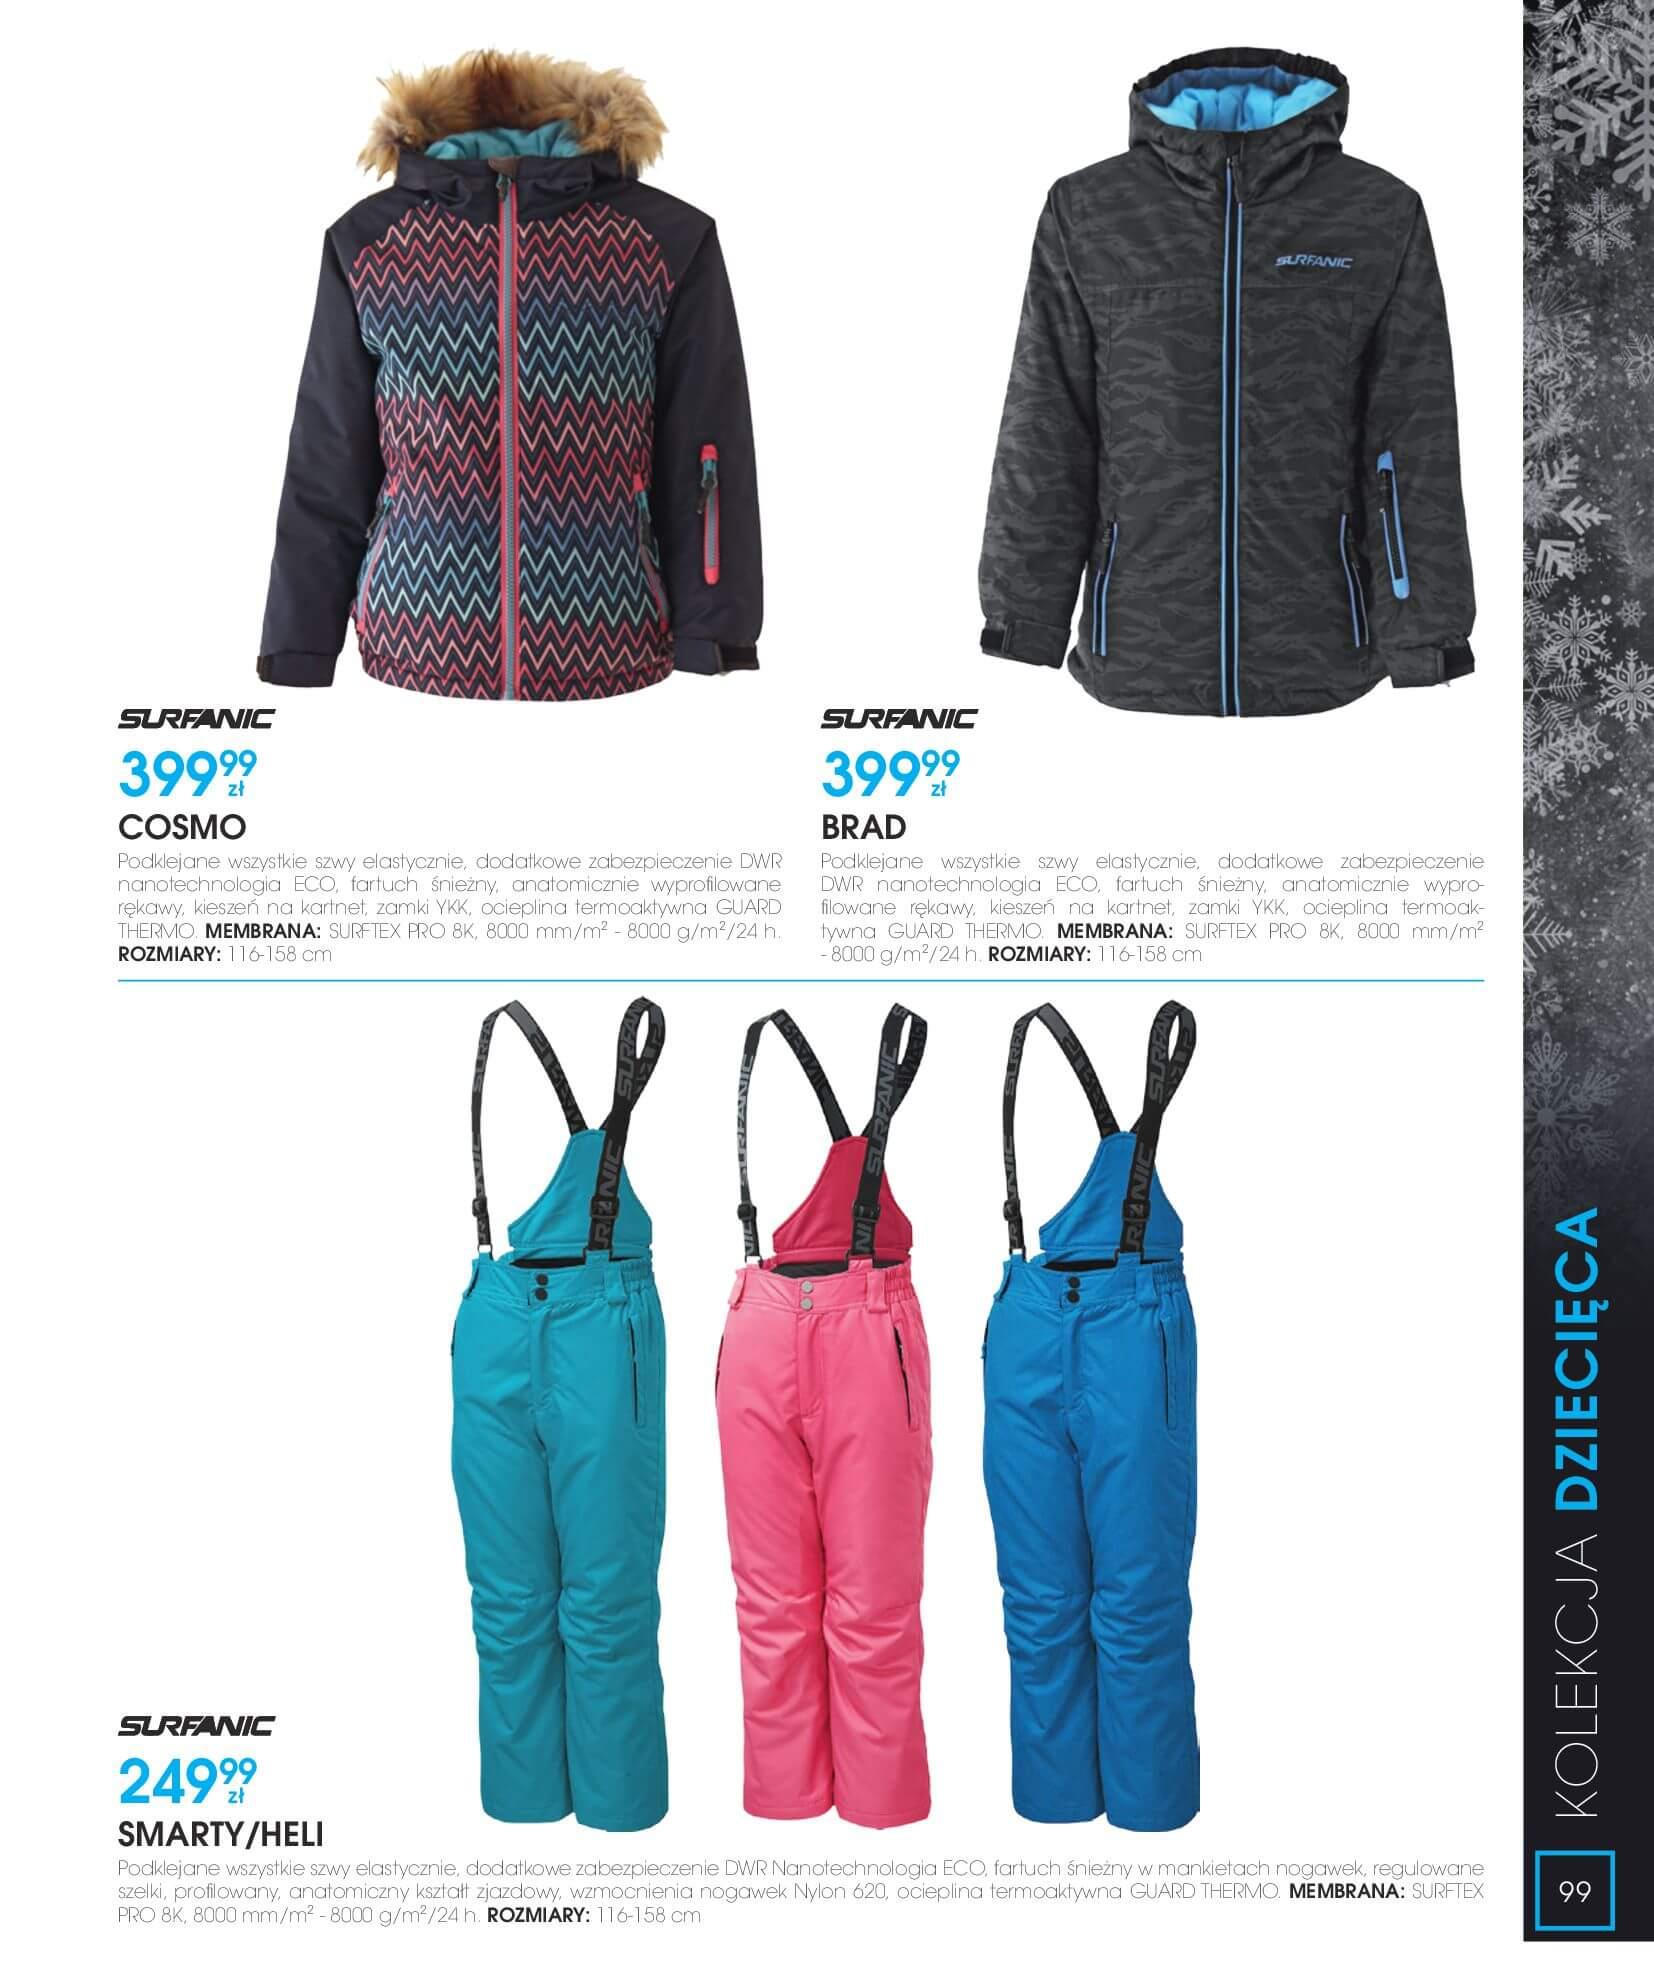 Gazetka Go Sport - Katalog Zima 2017/2018-12.11.2017-28.02.2018-page-99